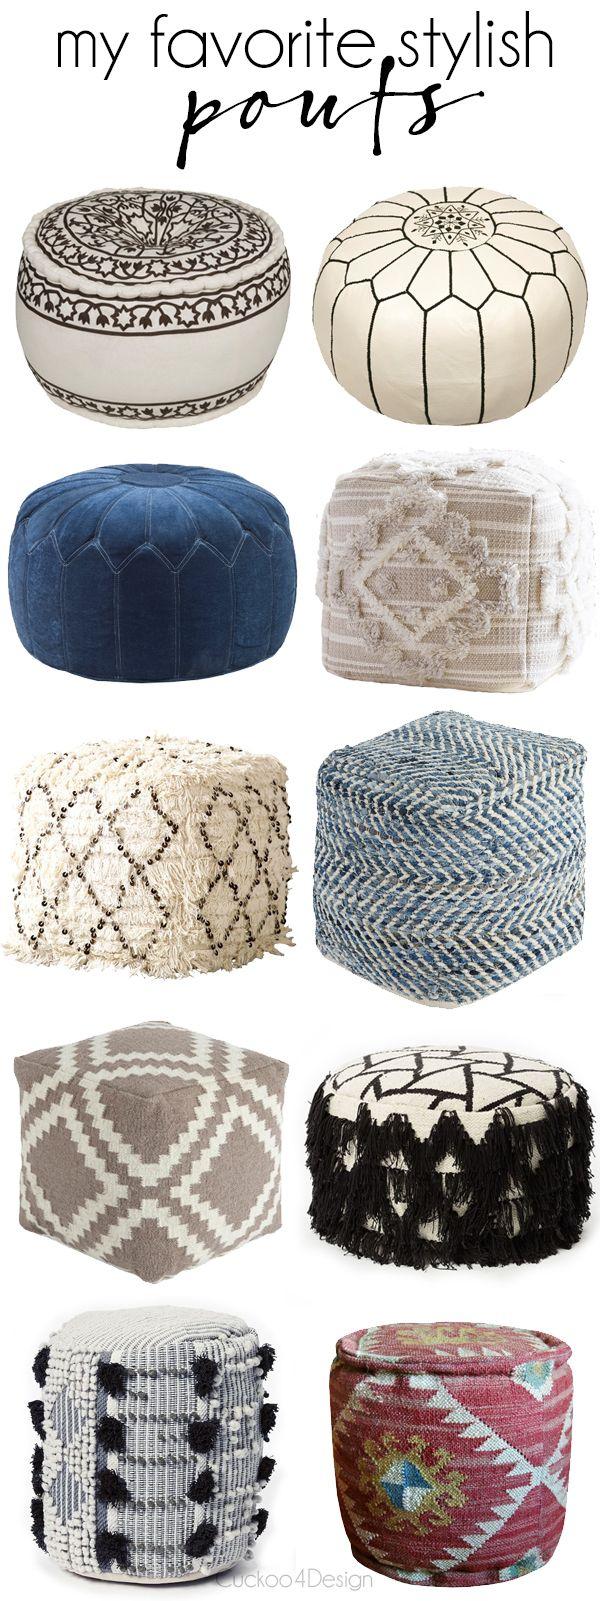 poufs | CURTAINS AND HOME | Pinterest | Home Decor, Home y Decor